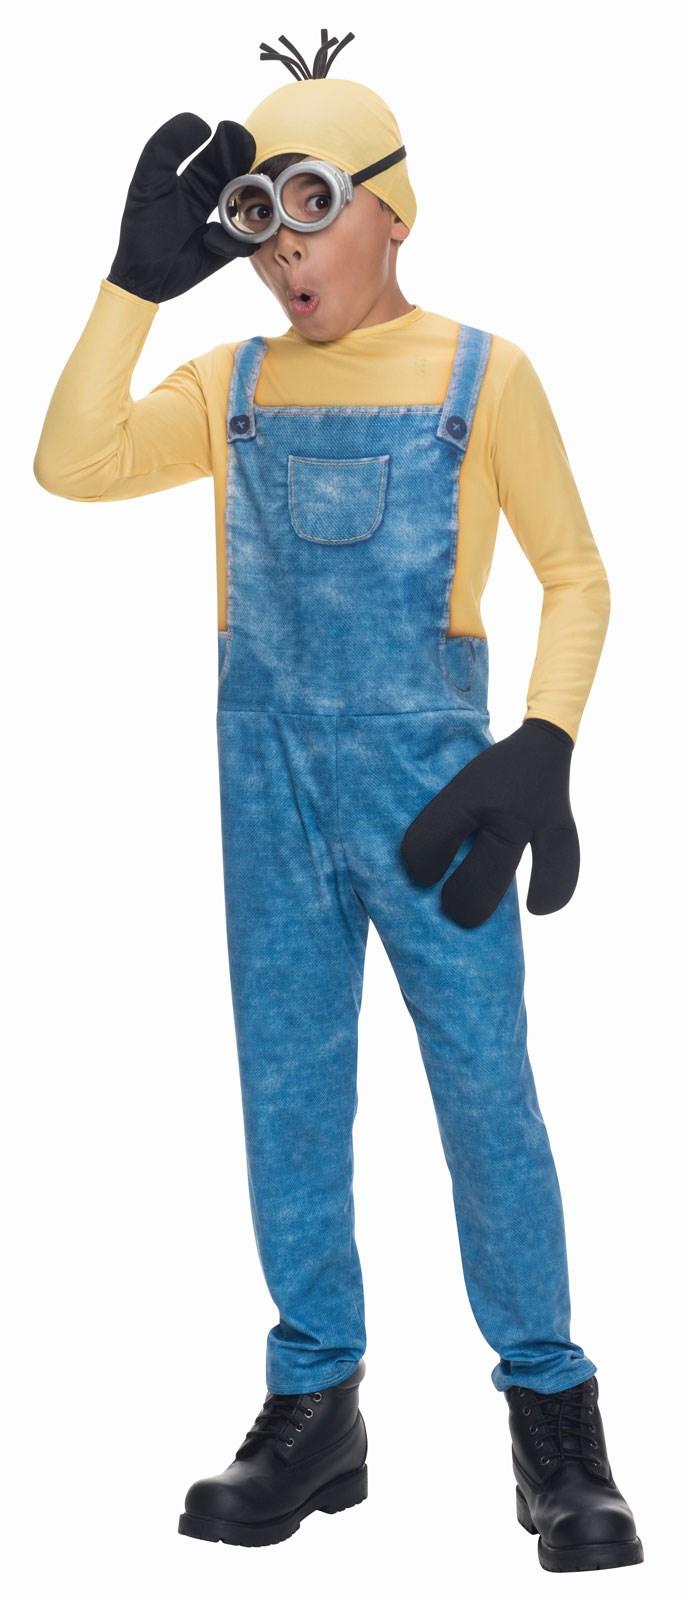 Minions Movie: Minion Kevin Kids Costume